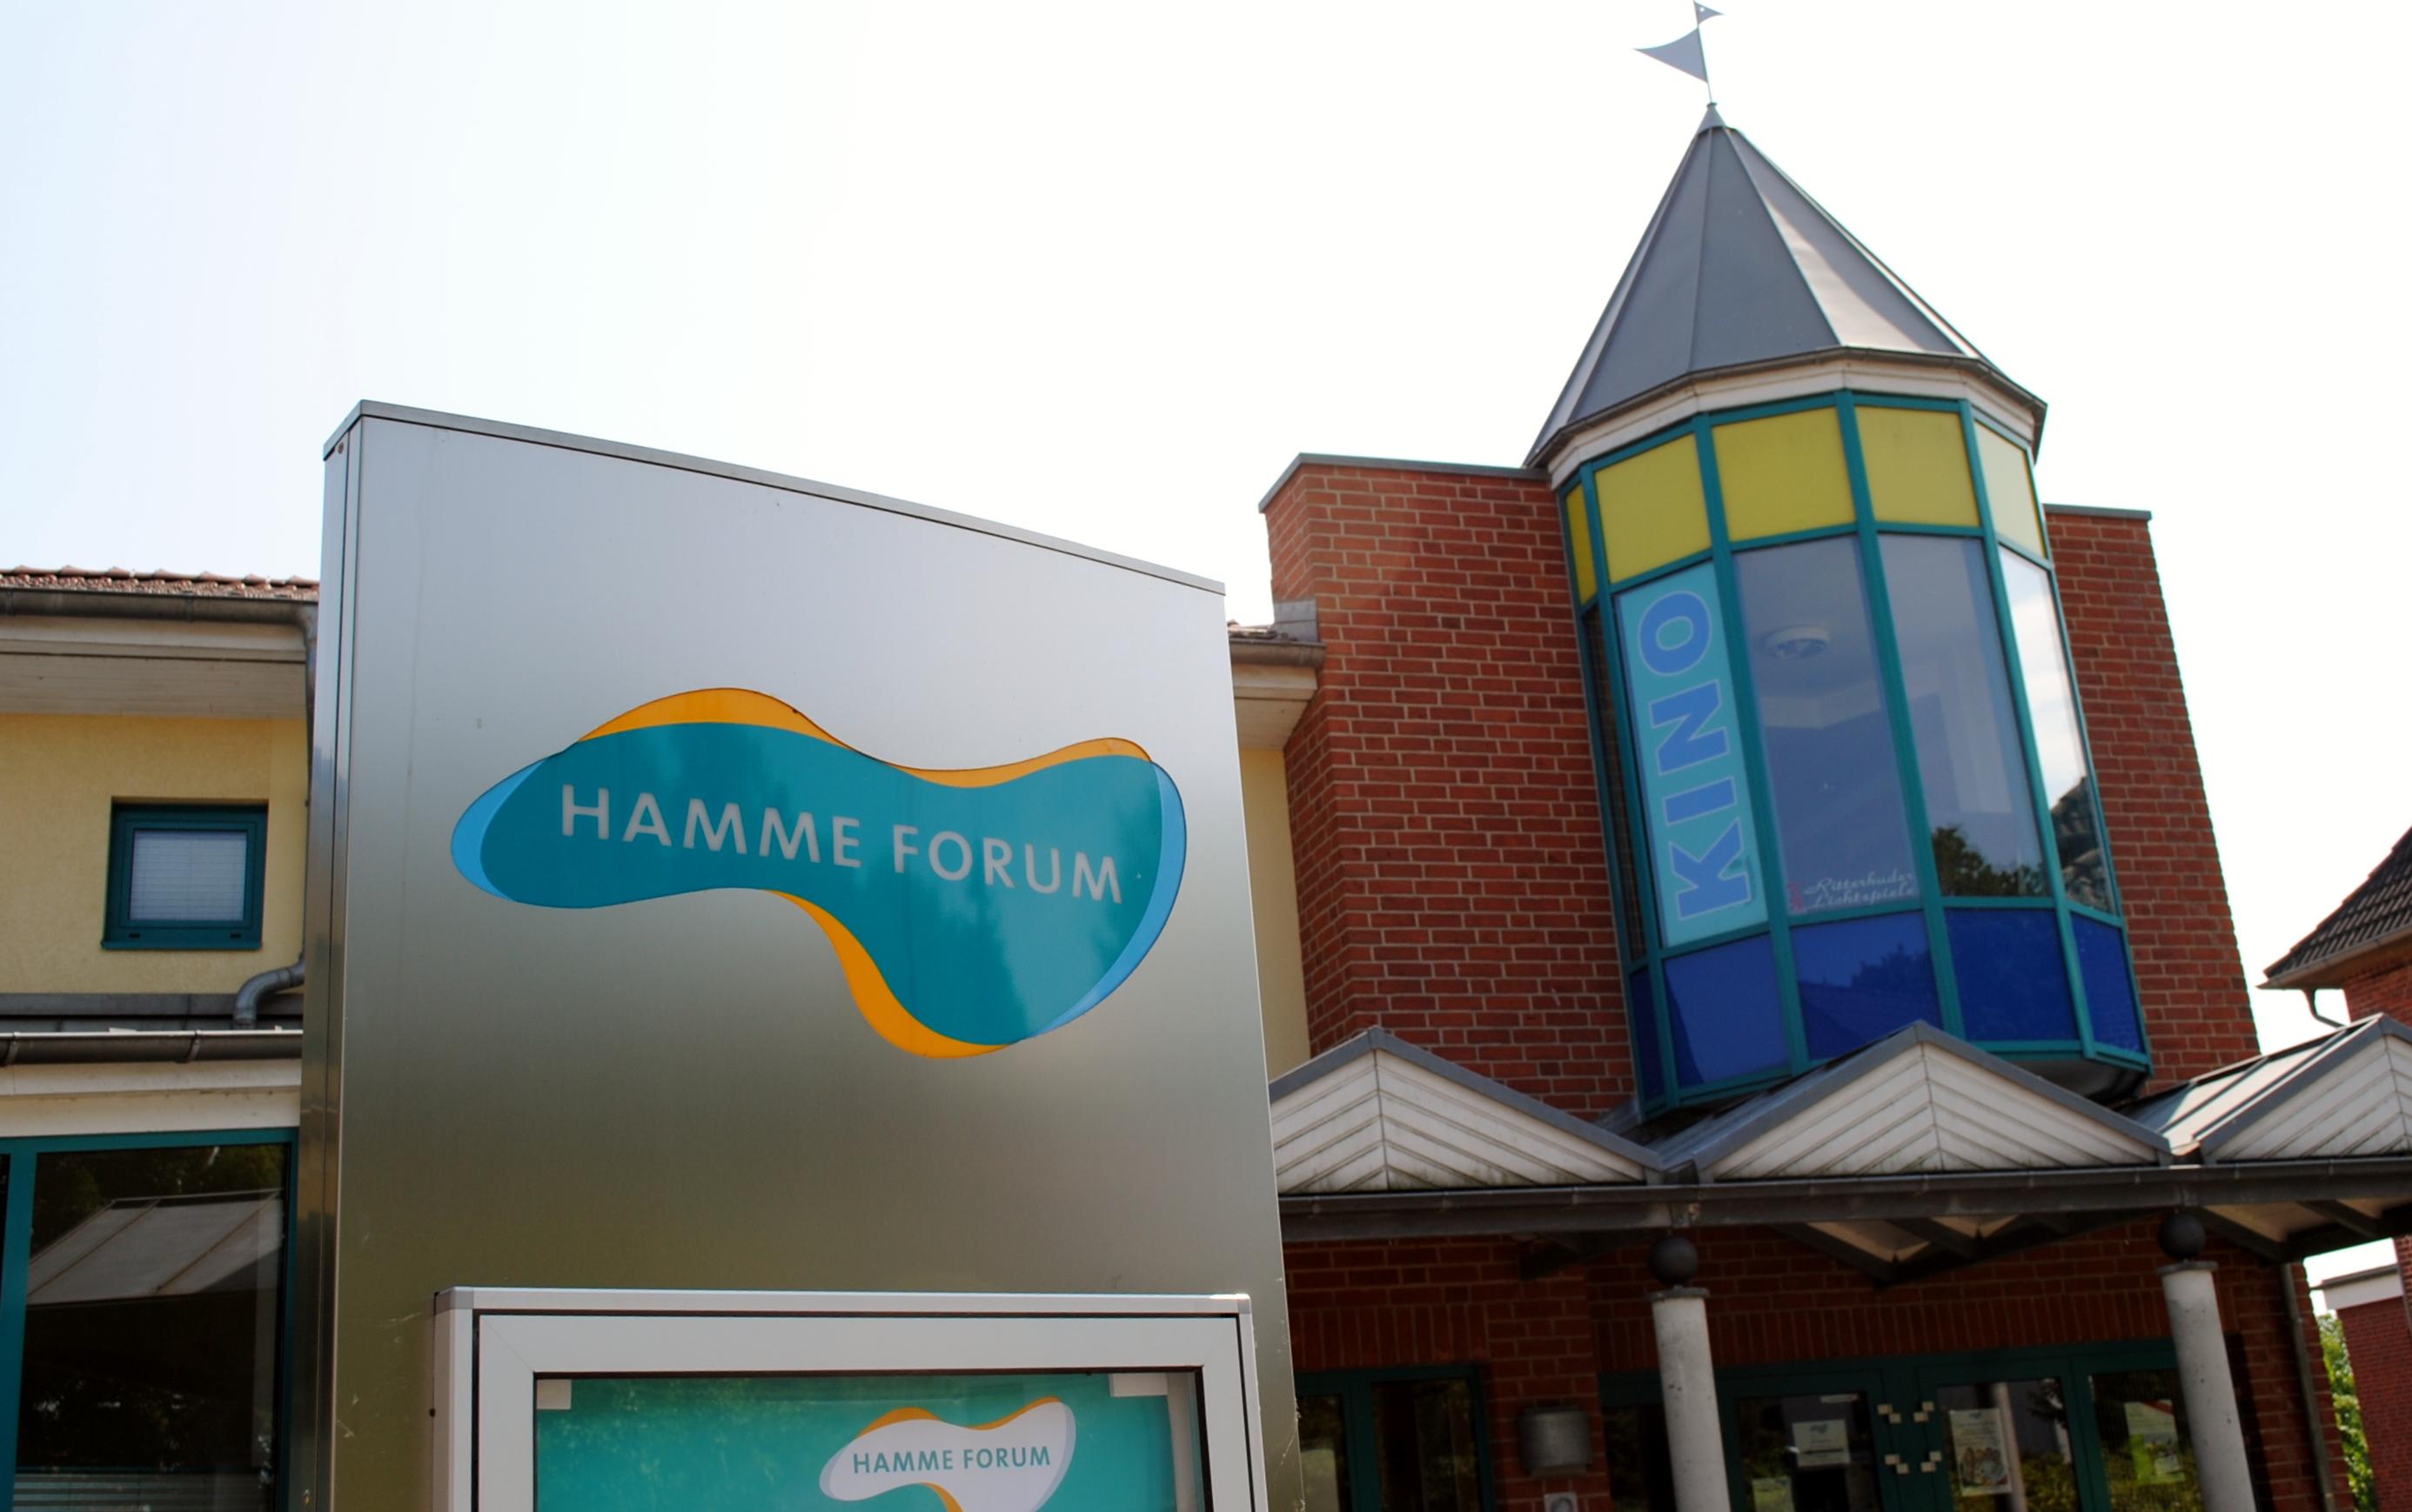 Kino im Hamme Forum